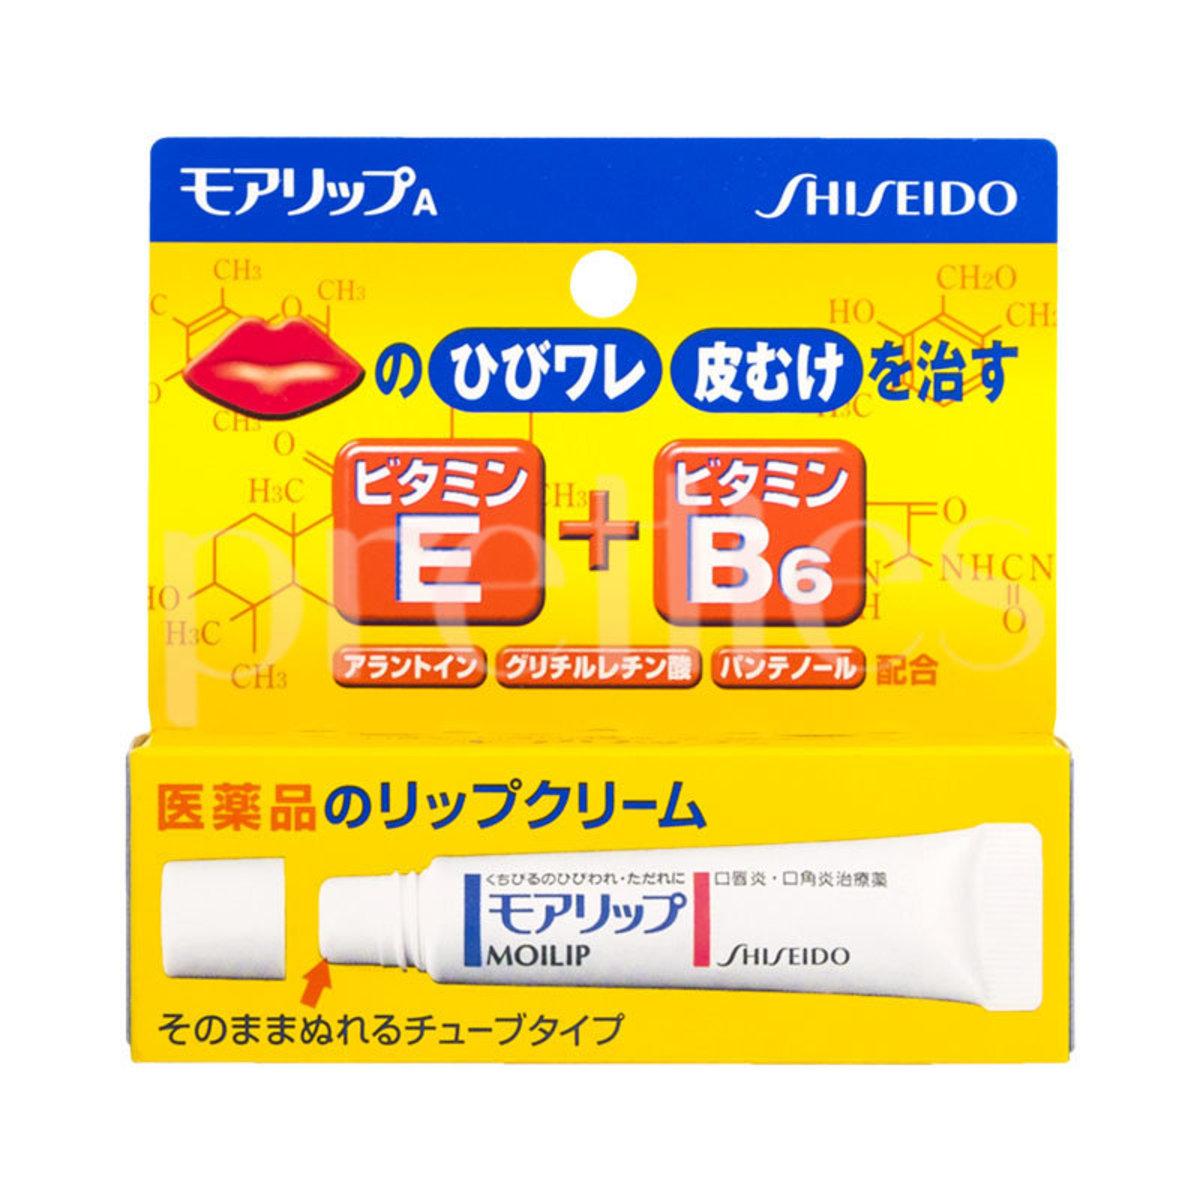 Shiseido Moilip Medicated Vitamin E B6 Lip Cream